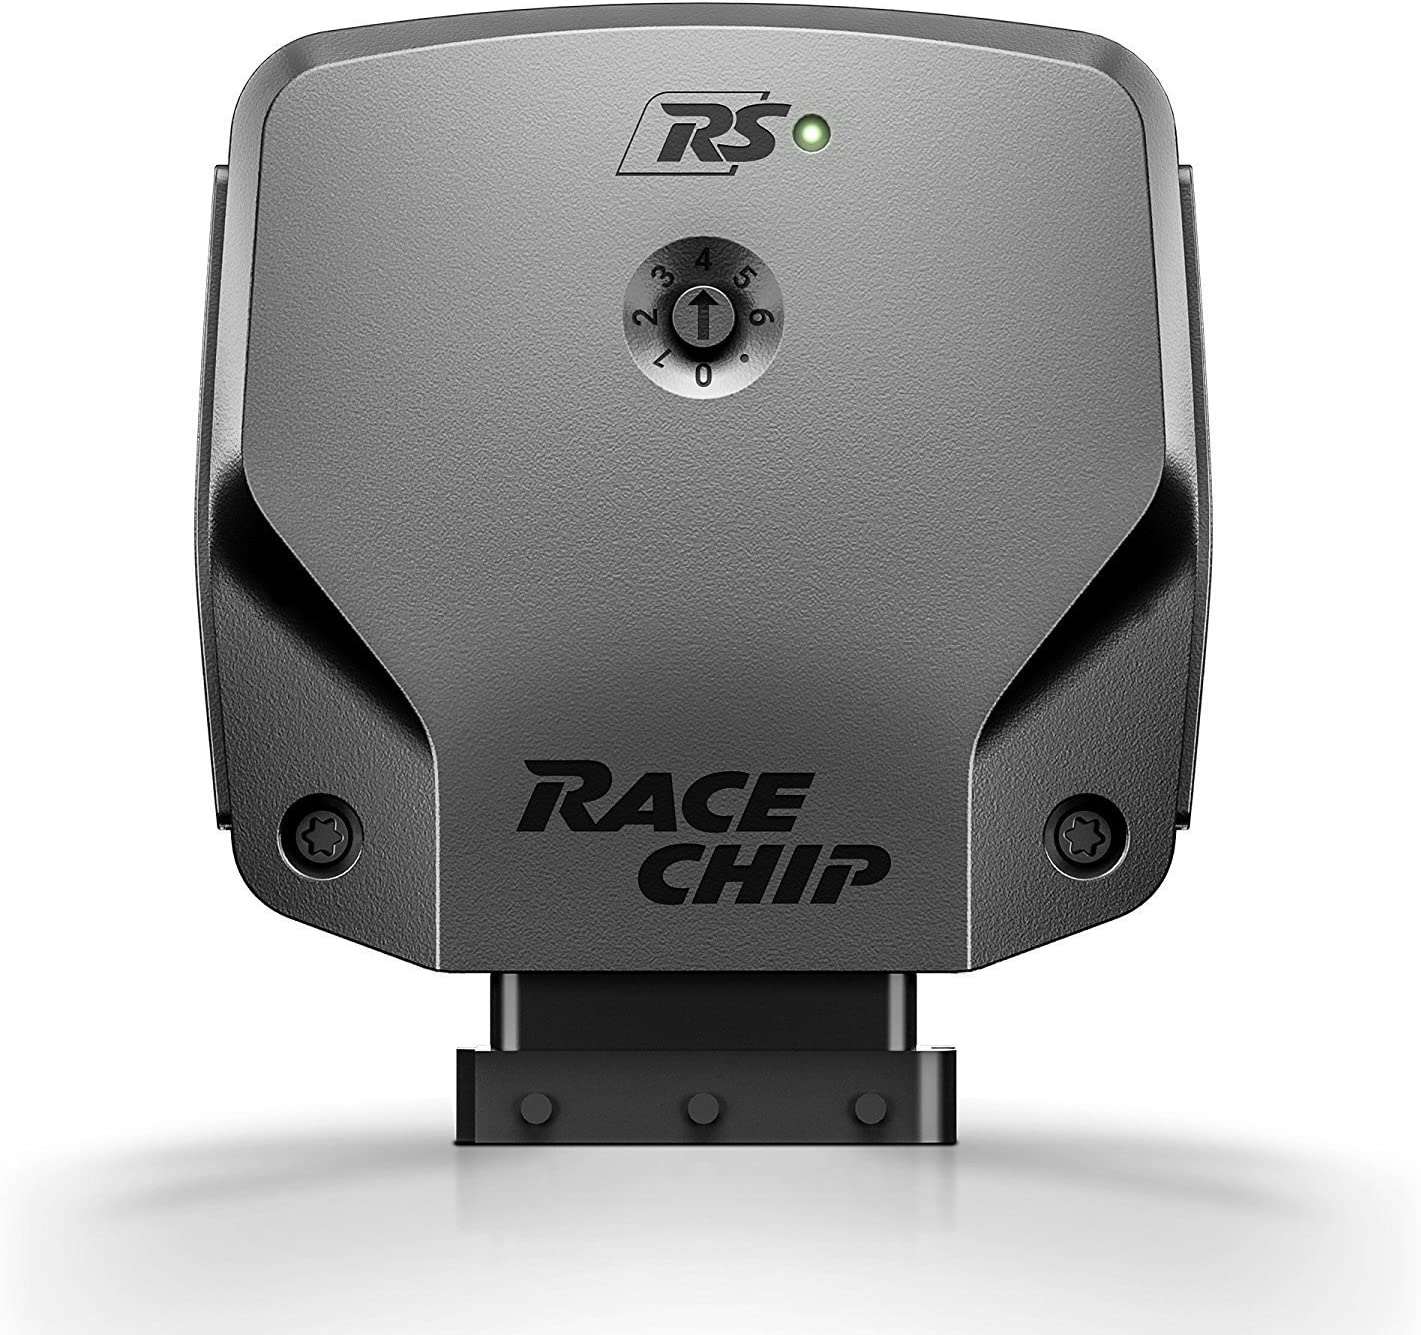 RaceChip RS Chiptuning f/ür Superb ab 2015 2.0 TDI 190 PS//140 kW Tuningbox 3V